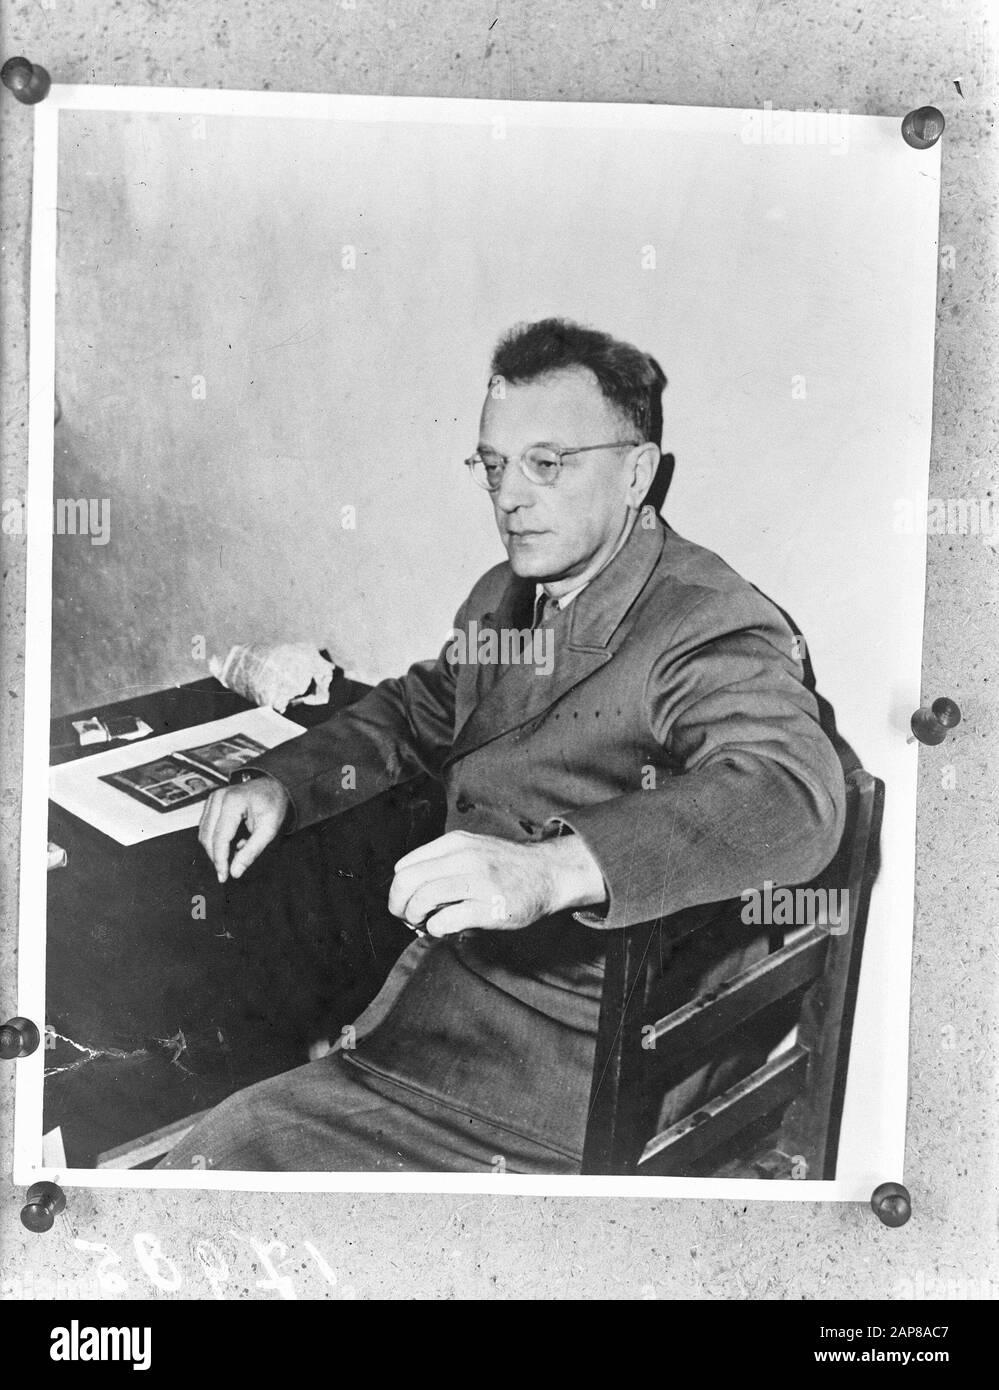 Arthur Seyss-Inquart Annotation: Photo presumably taken in prison cell in Nuremberg. Original registration title: Seys 1/4 (Inquert) Date: June 6, 1946 Personal name: Seyss-Inquart, Arthur Stock Photo